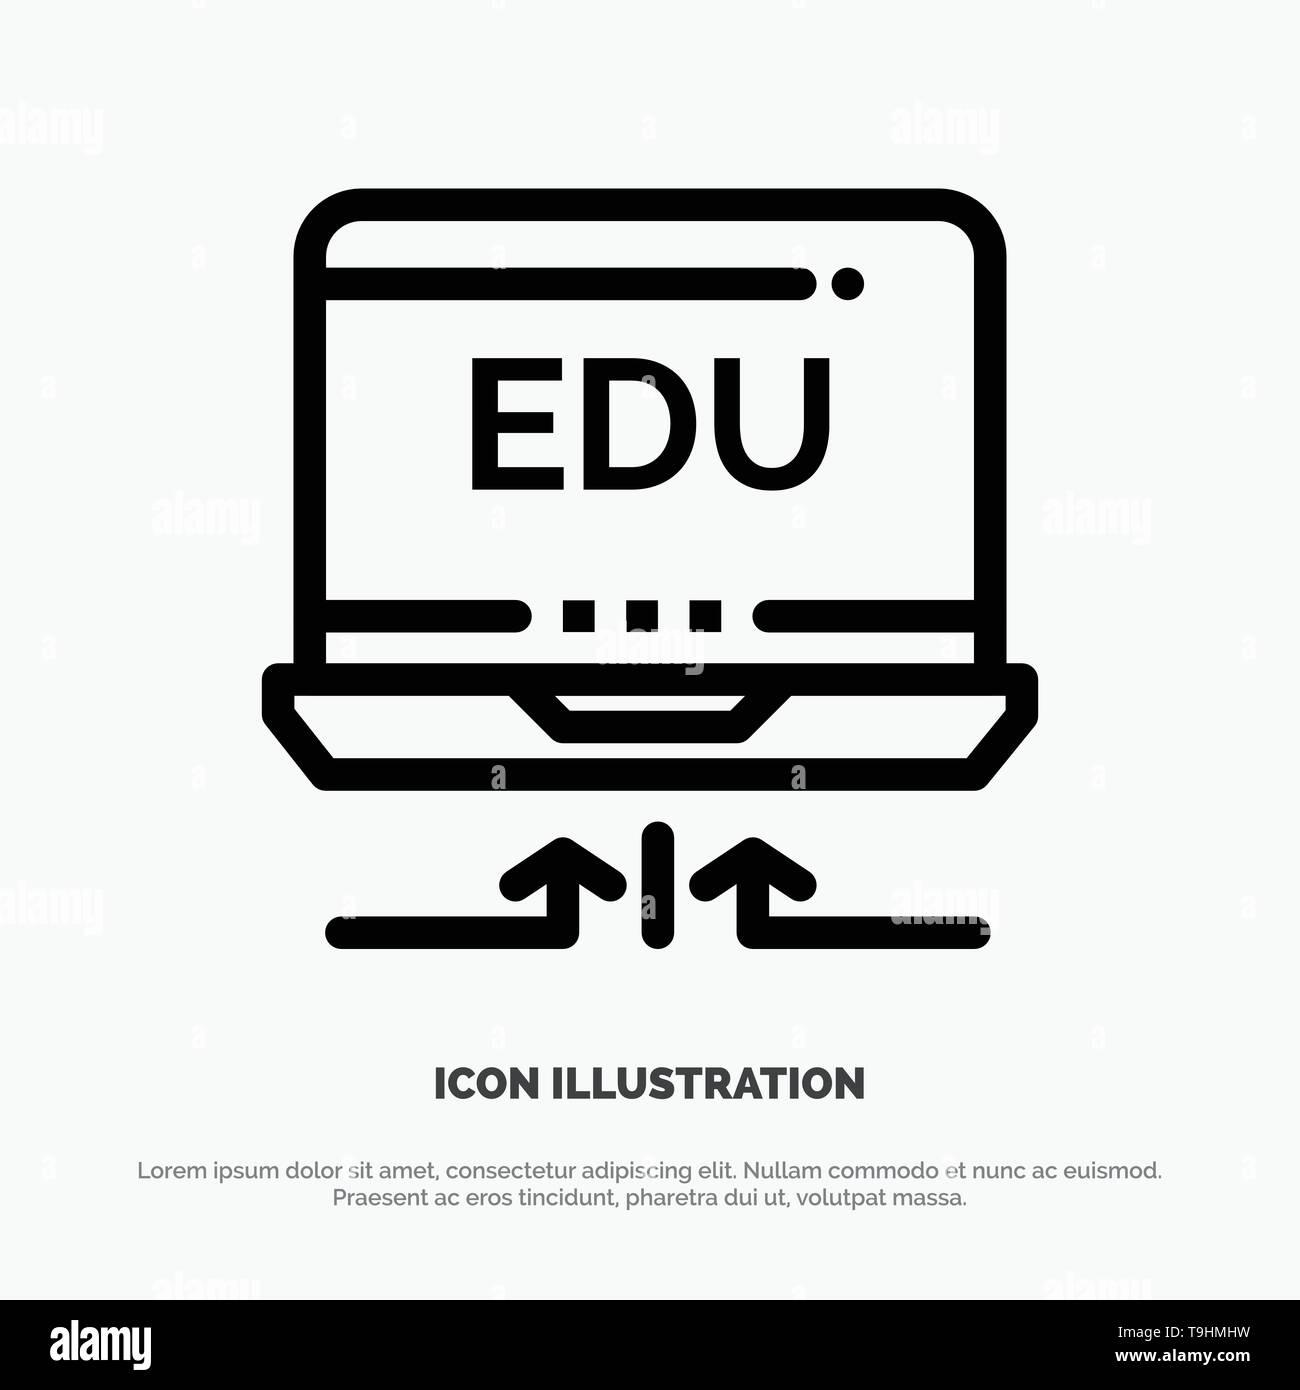 Laptop, Hardware, Arrow, Education Vector Line Icon - Stock Image